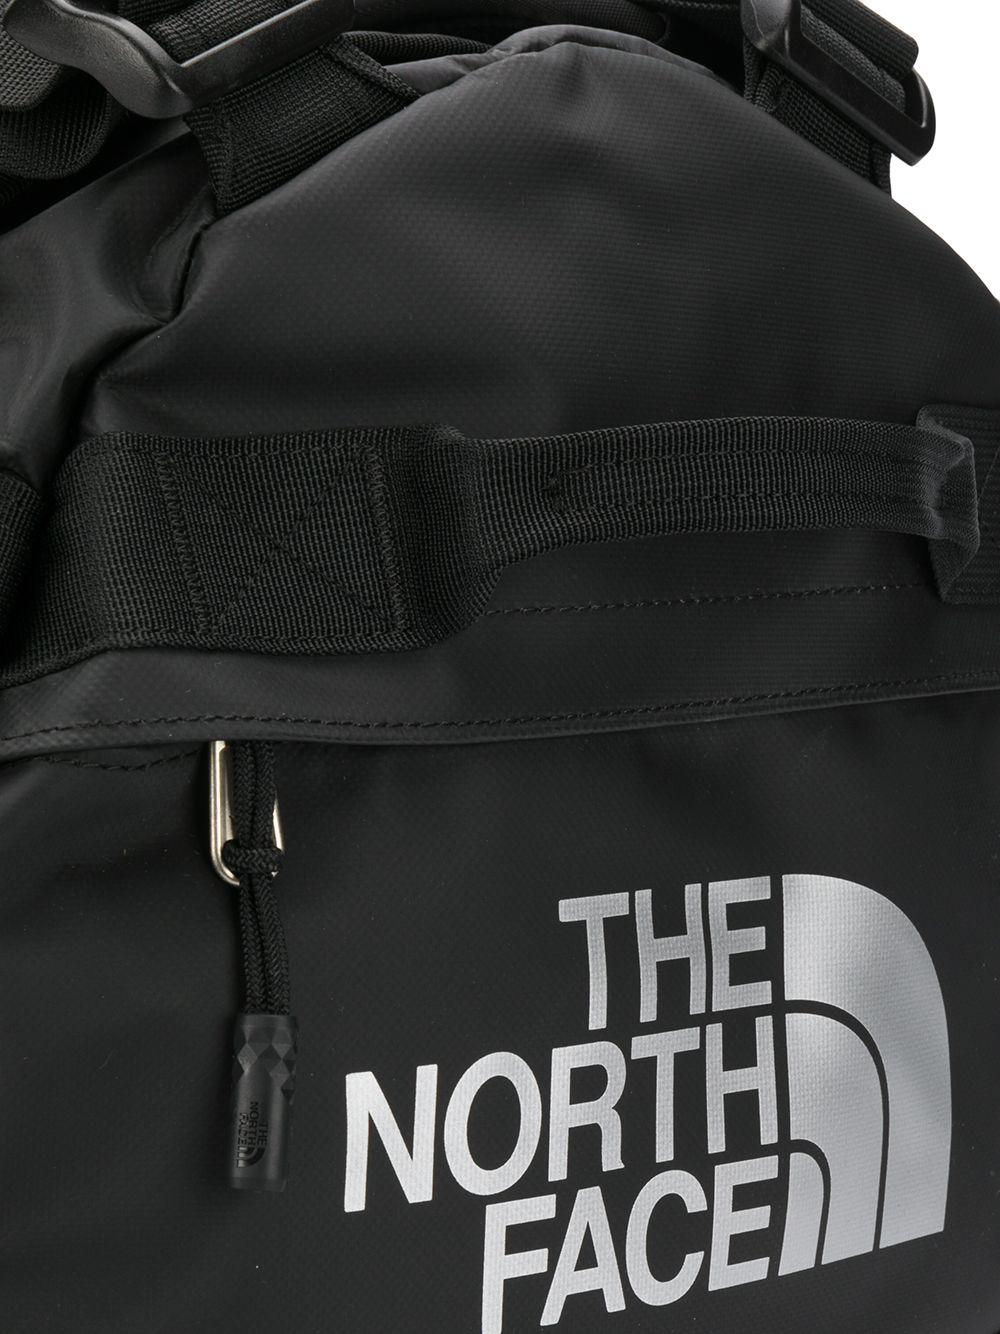 BASECAMP BACKPACK THE NORTH FACE | Bags | NF0A3ETOJK31